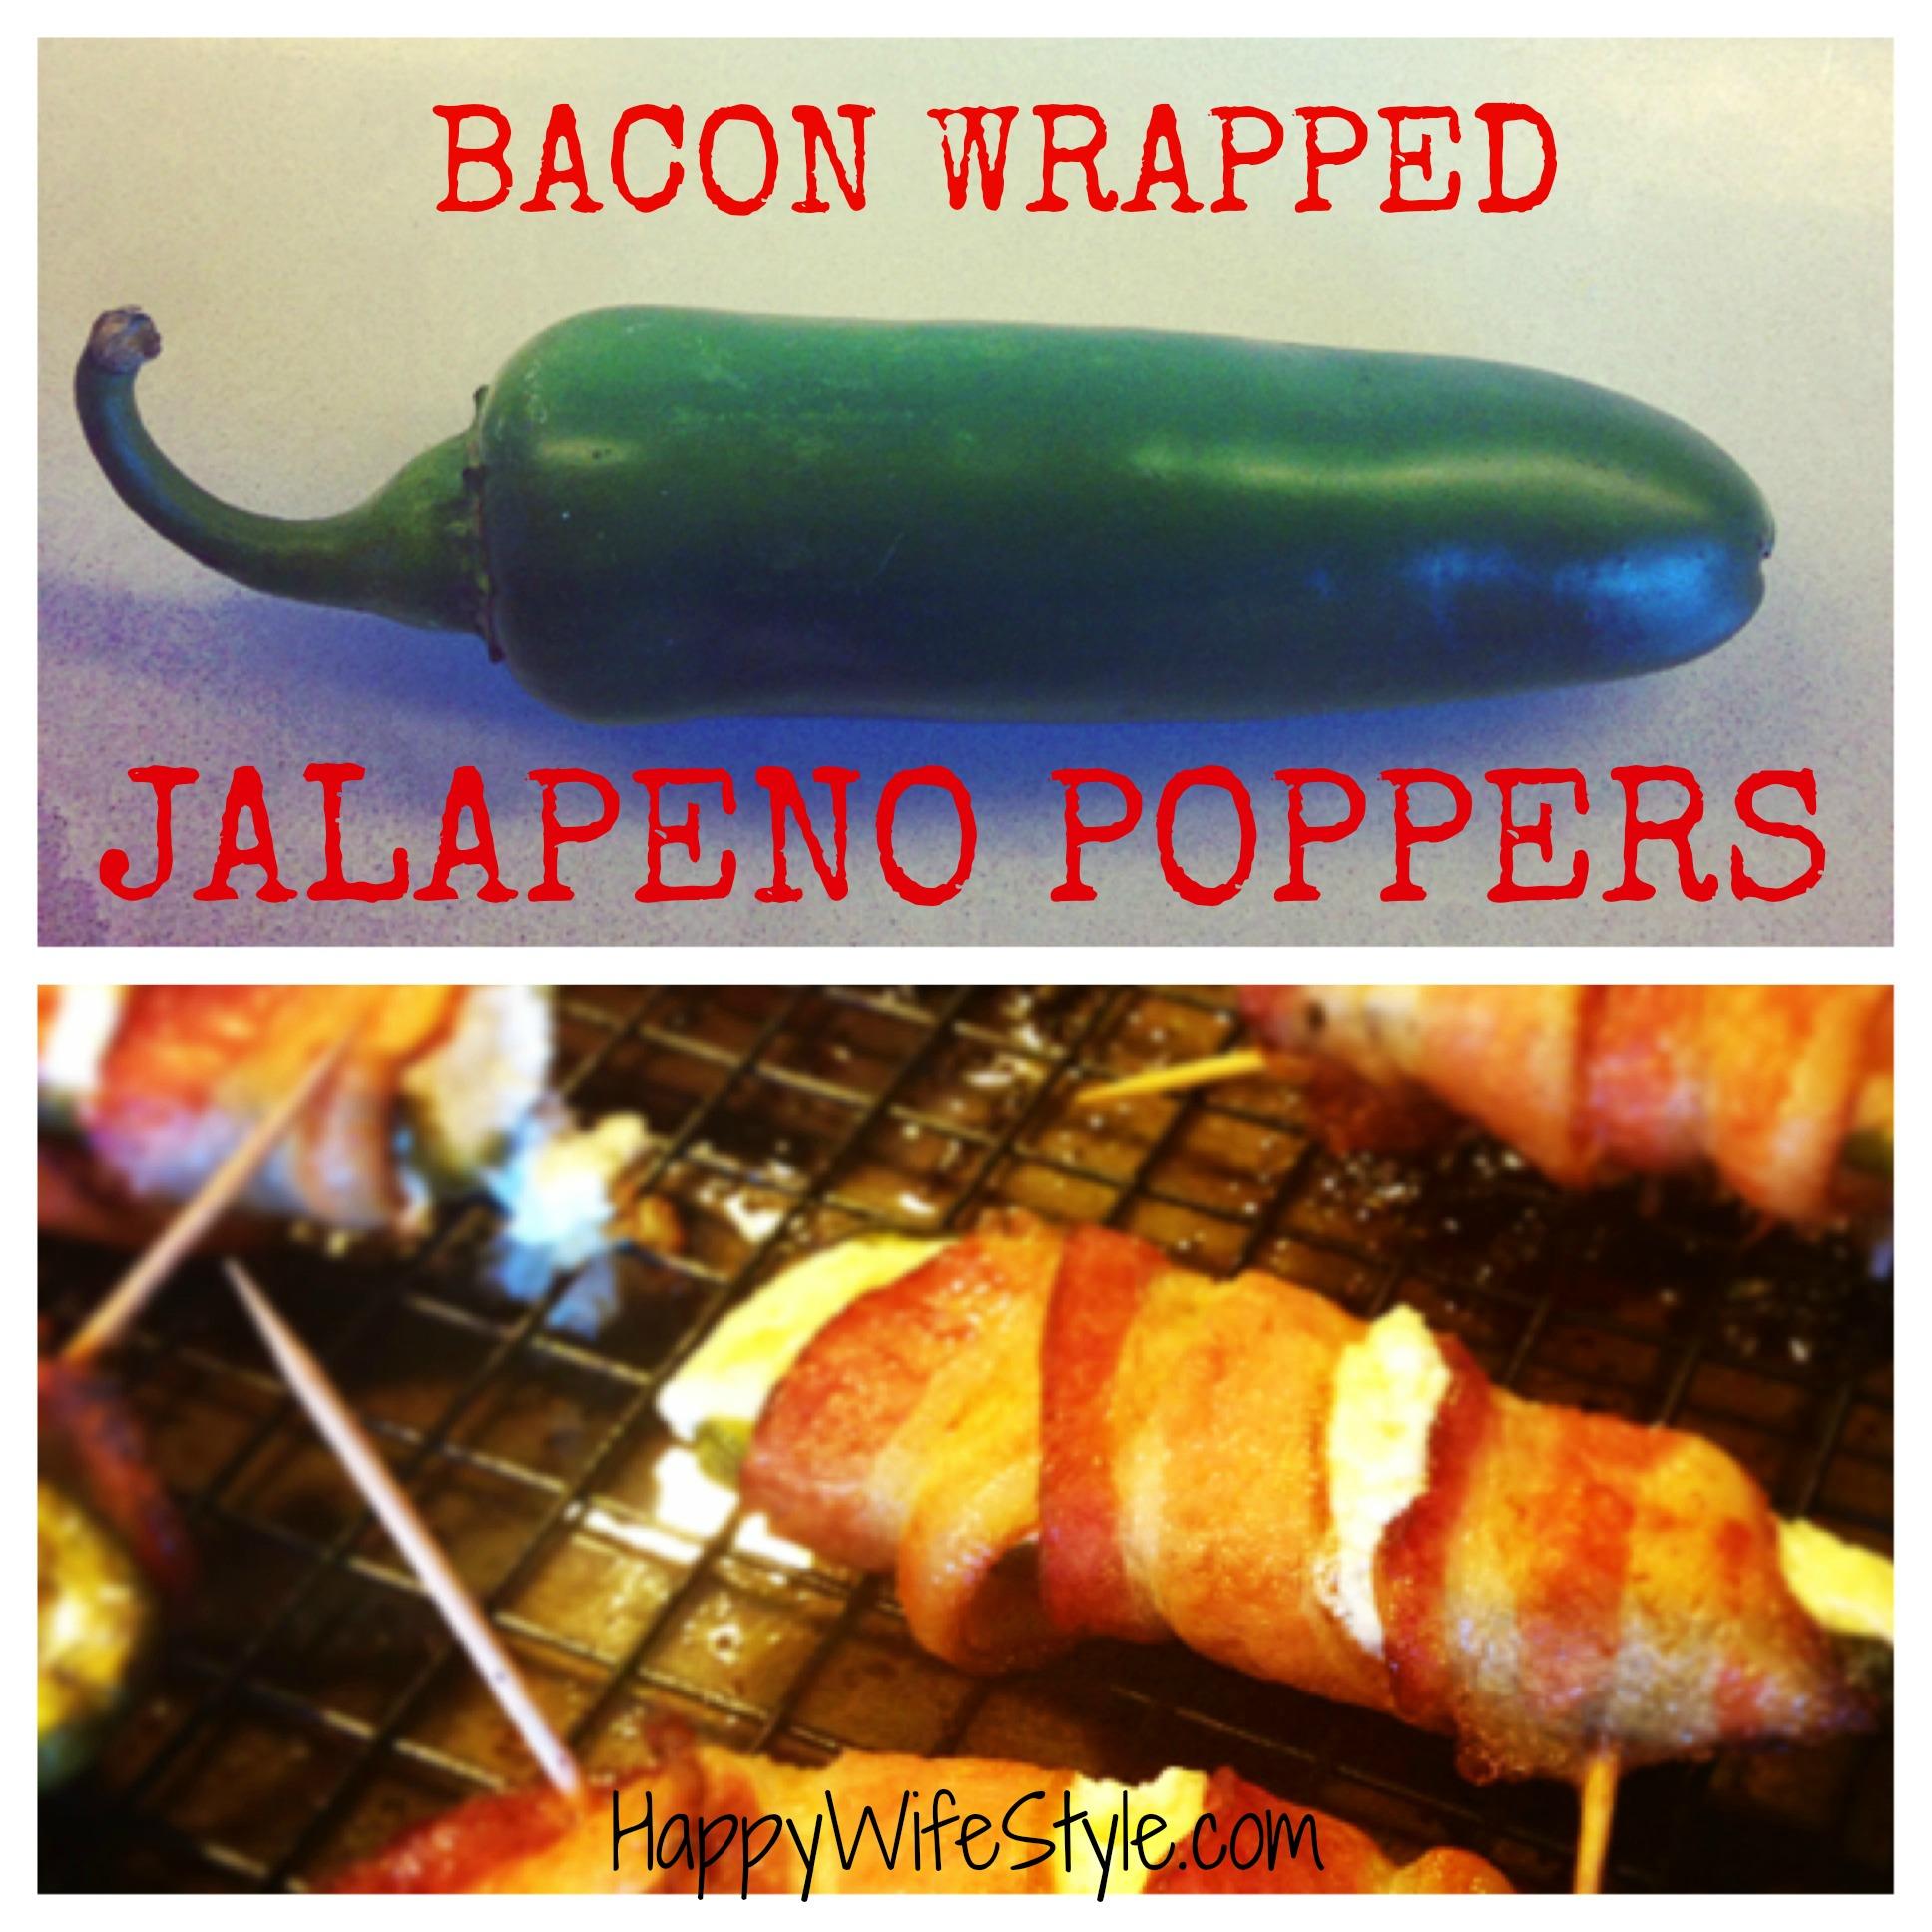 jalapeño-poppers